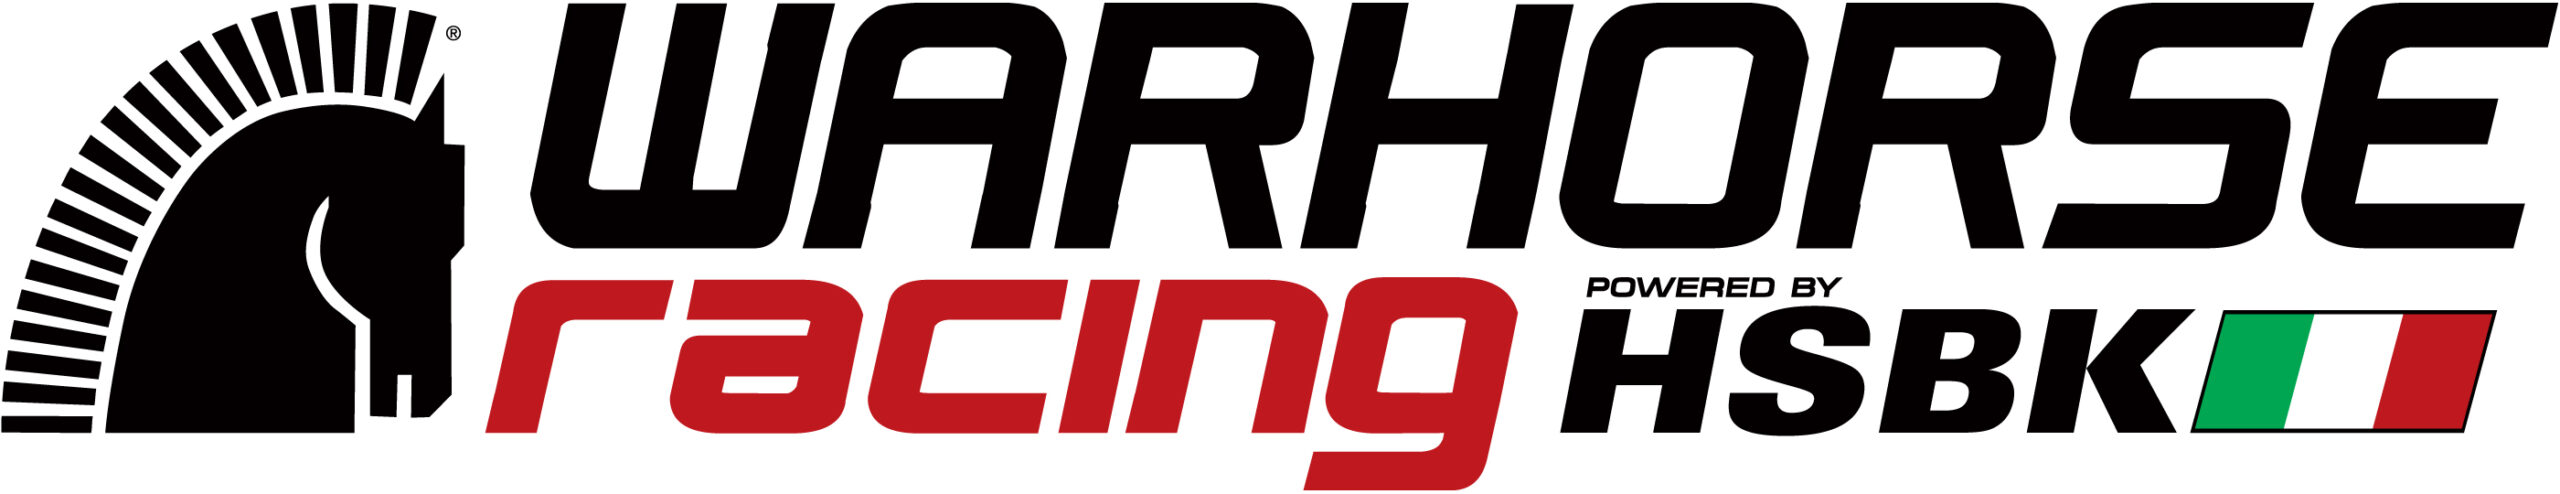 Three industry leaders unite to create Warhorse Racing powered by HSBK